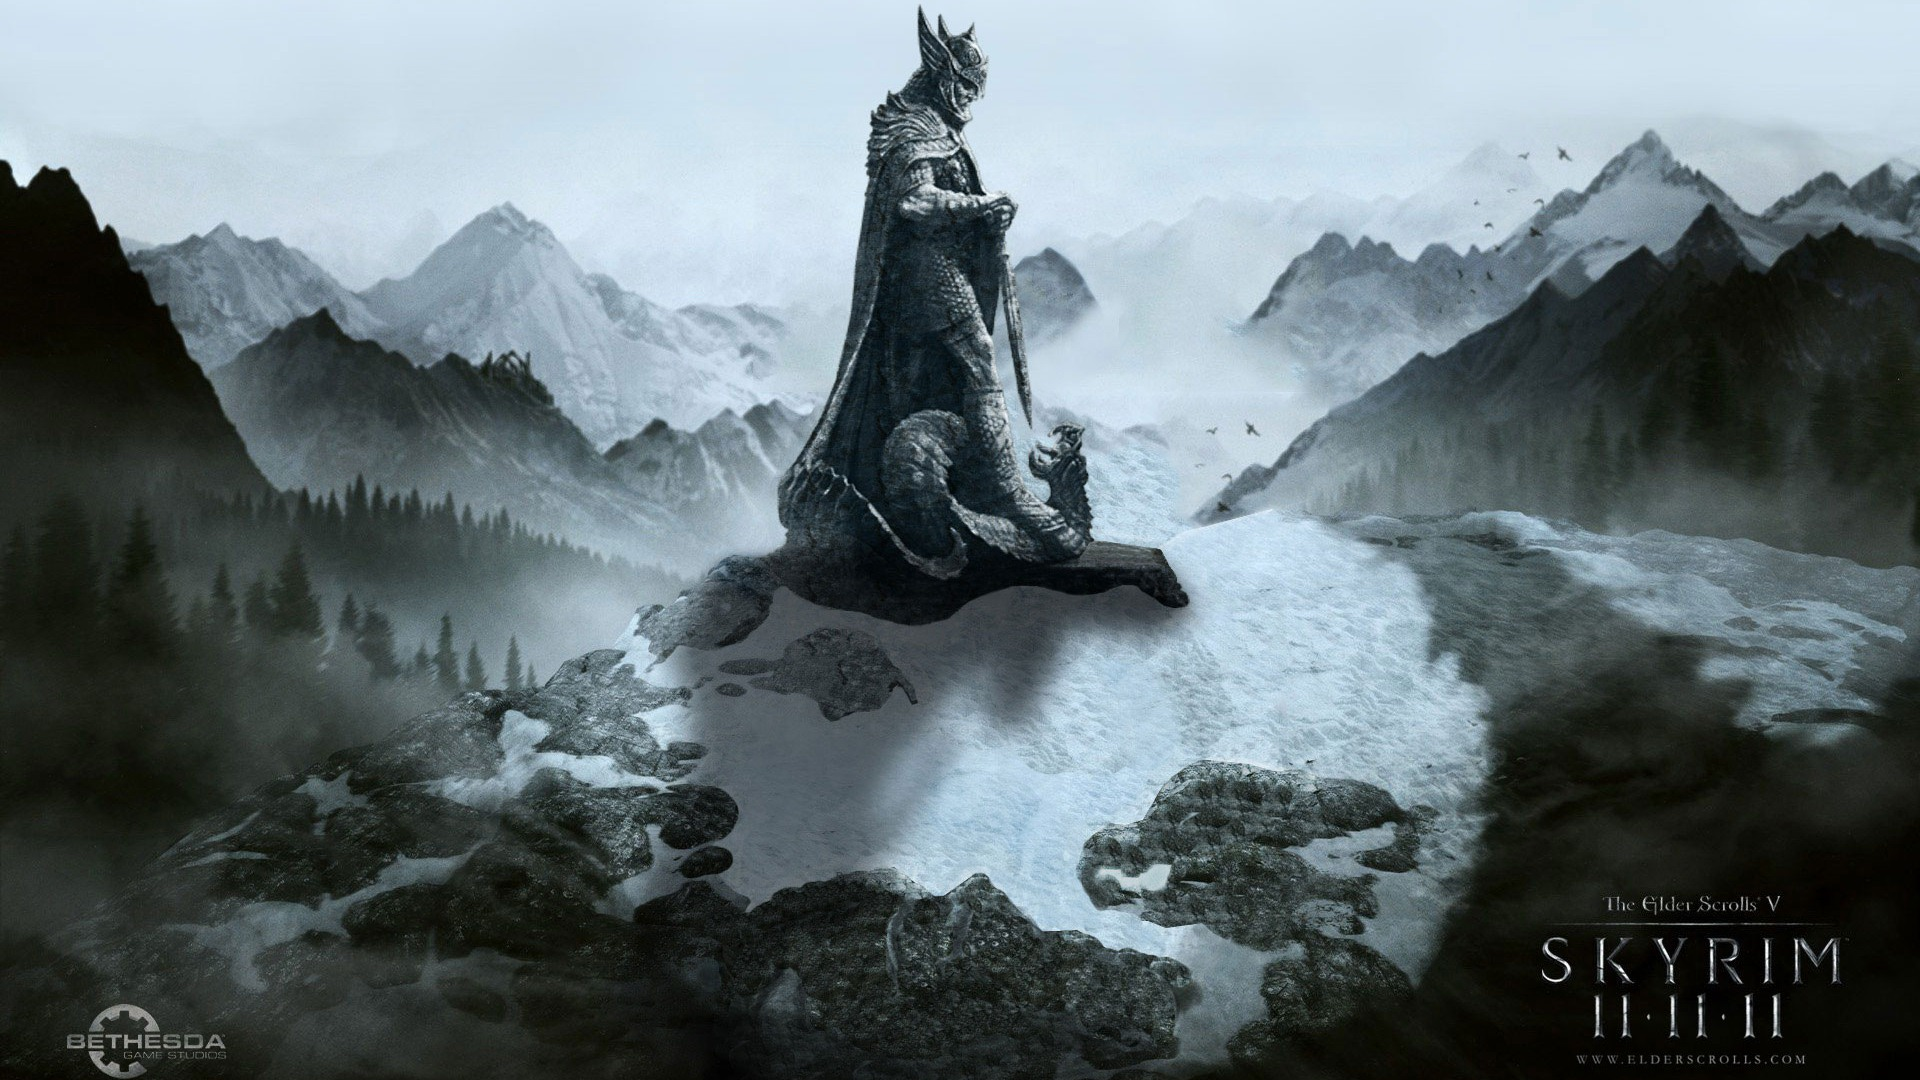 Hd wallpaper windows 10 1080p - The Elder Scrolls V Skyrim 5 16 1920x1080